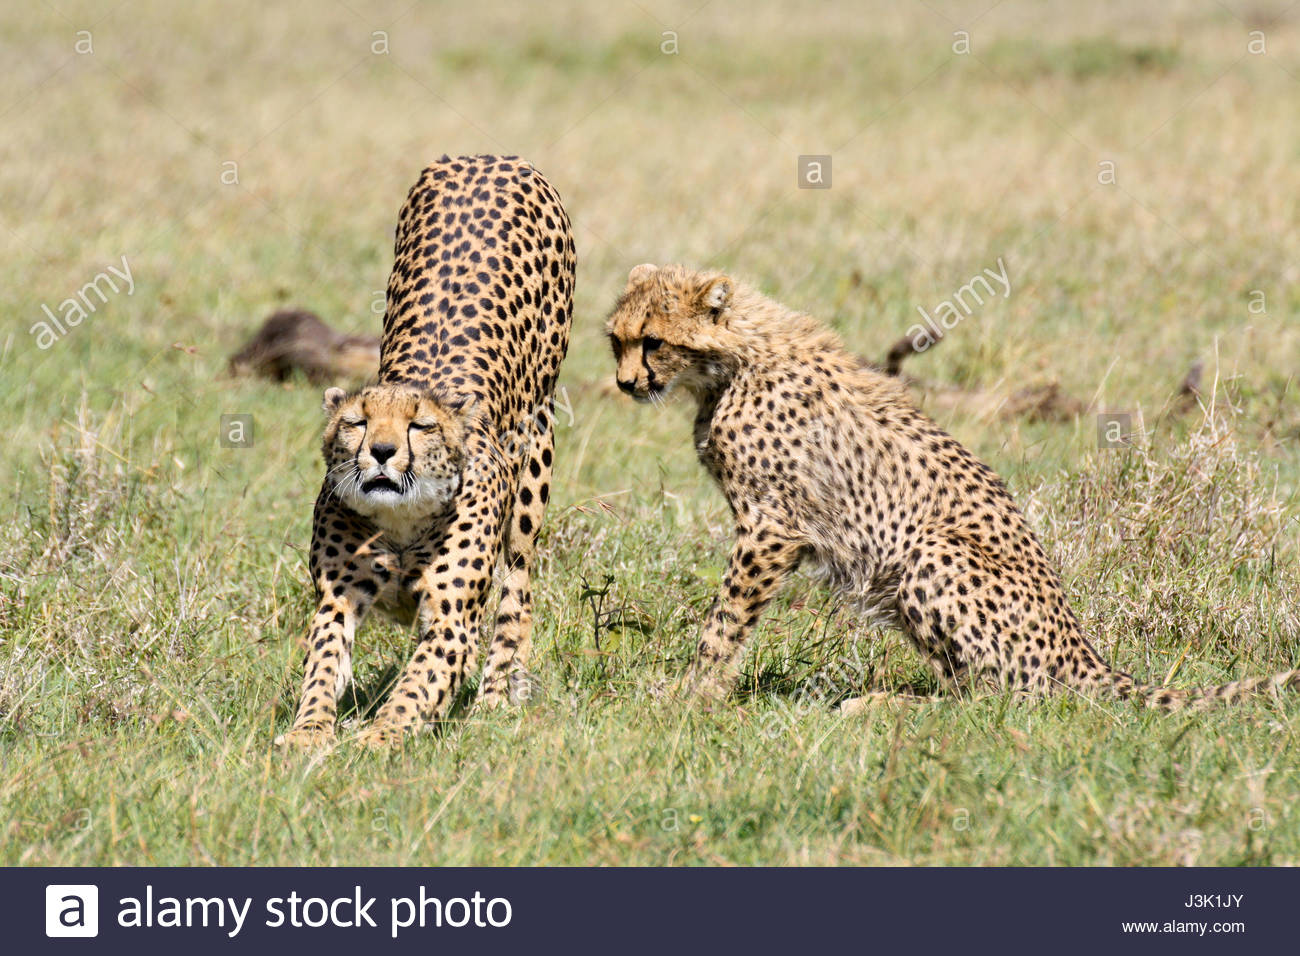 A female cheetah (Acinonyx jubatus) stretches while her half-grown cub  looks on. Ol Pejeta Conservancy, Kenya.